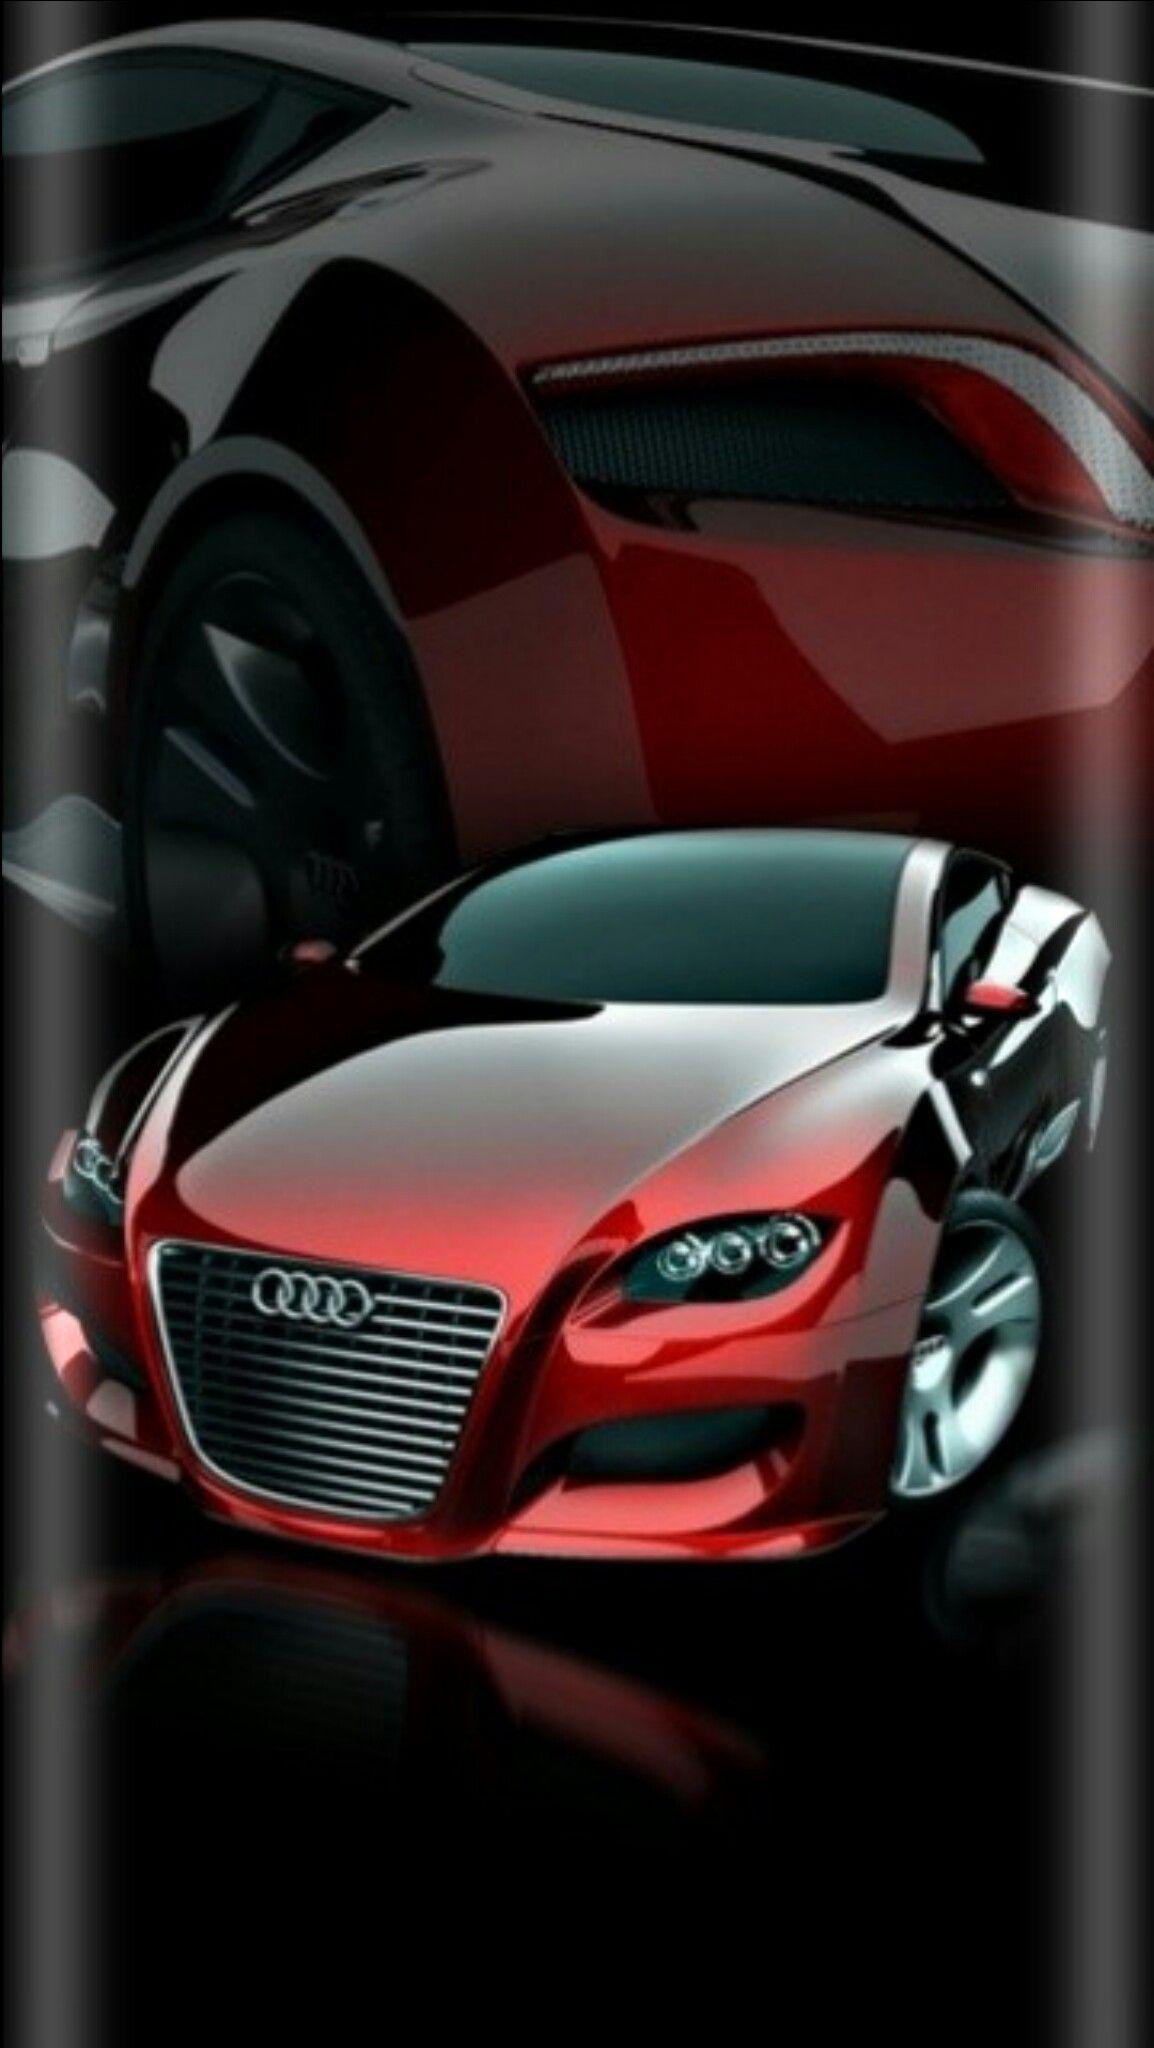 Pin De Amen Amen Em سيارات Papel De Parede Celular Fotos Audi